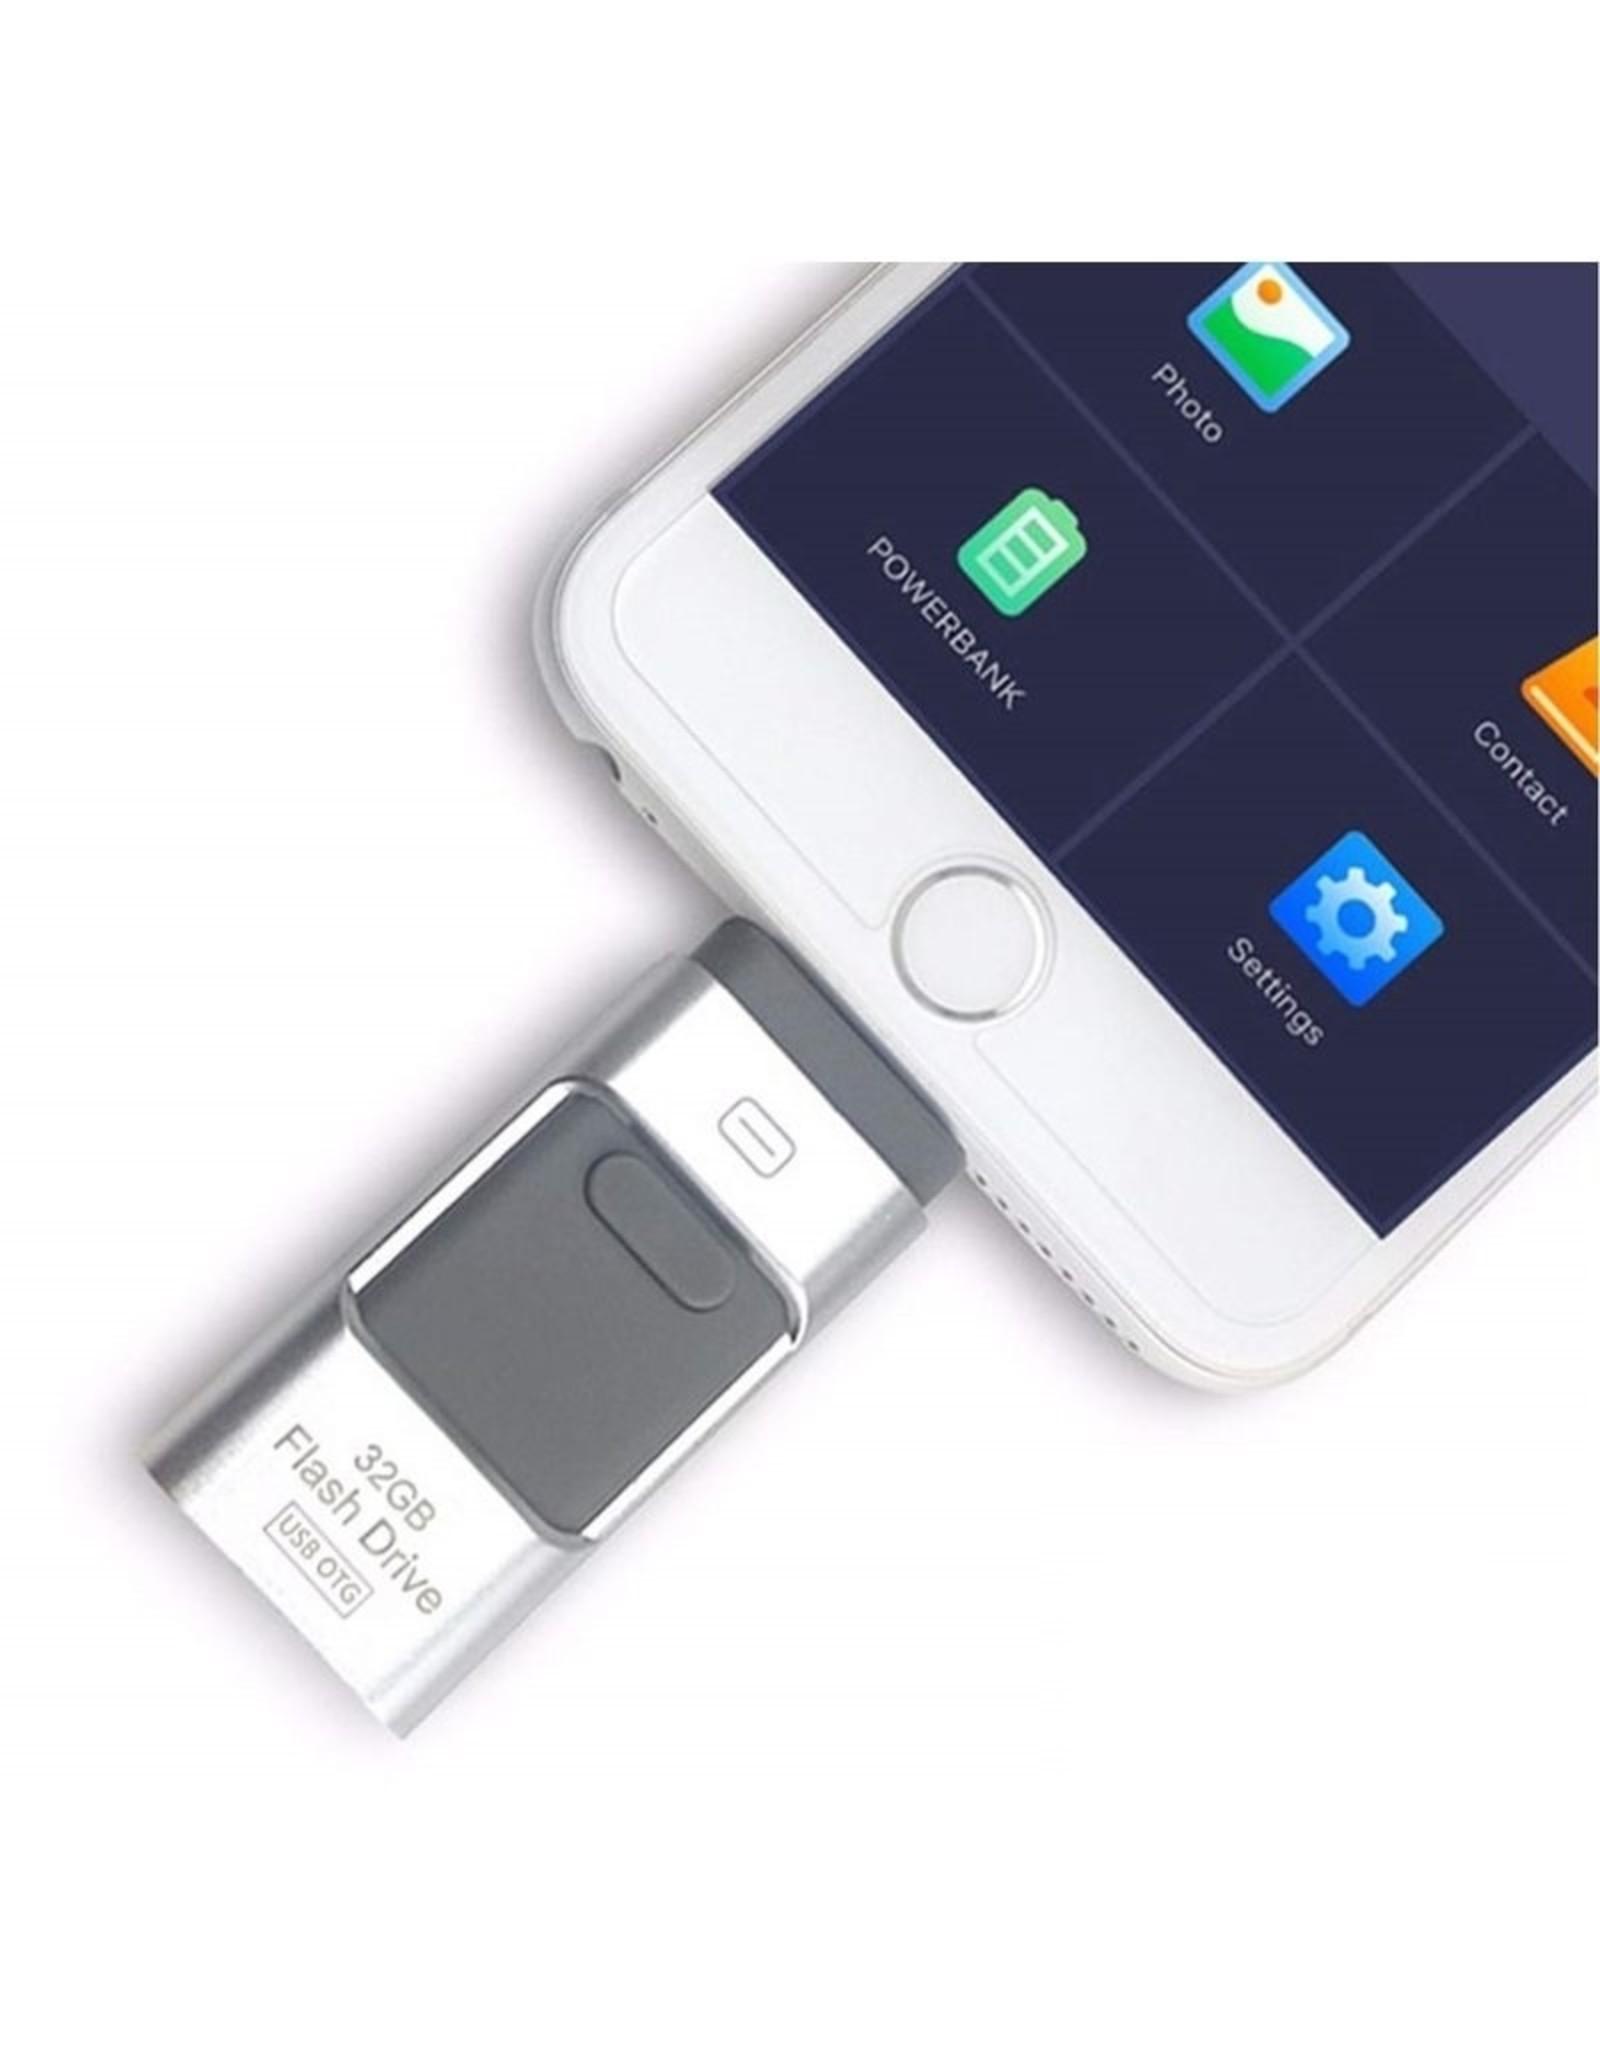 Parya Official 3-in-1 Flash Drive - Met Aansluiting Voor Telefoons